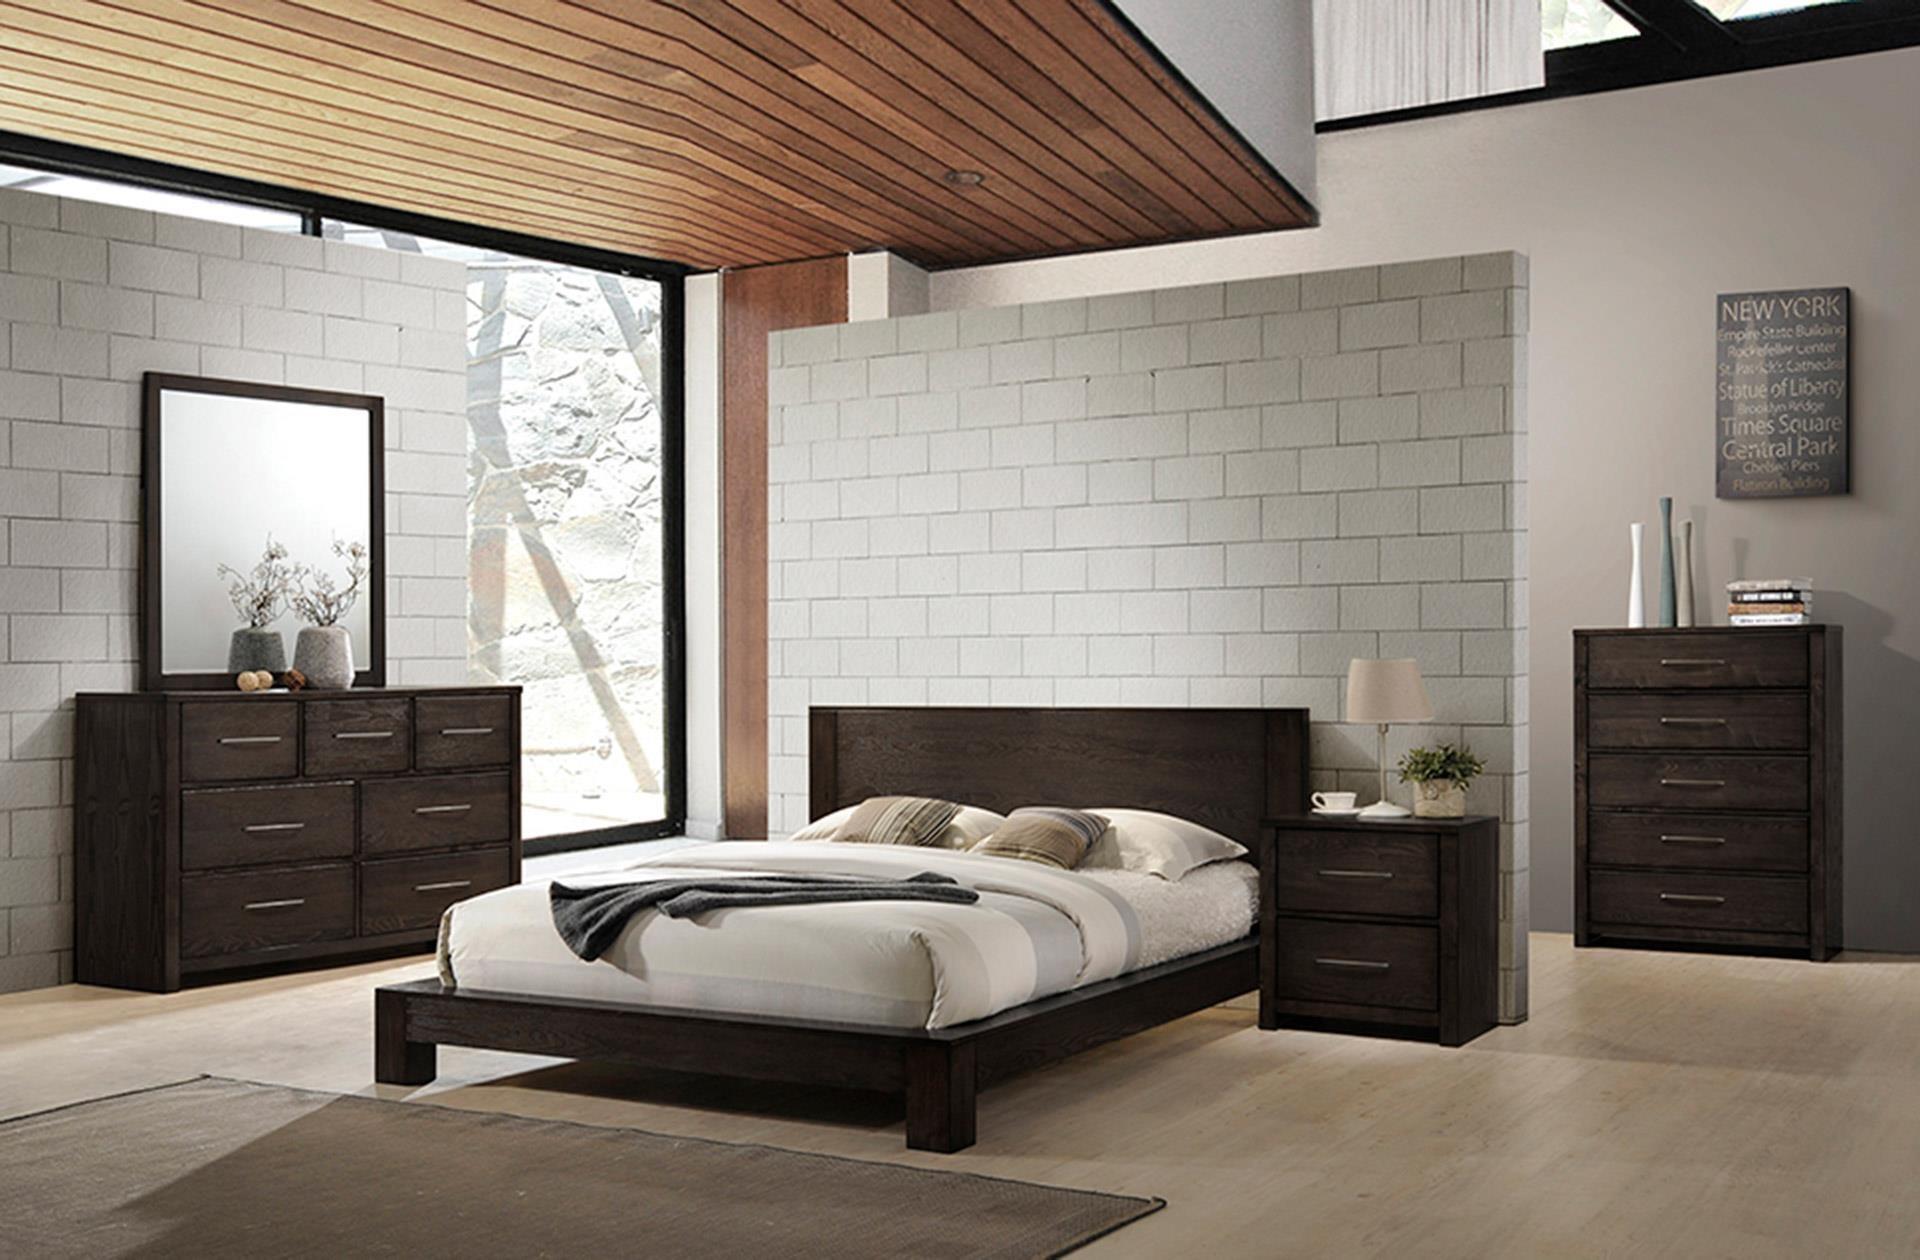 King Platform Bed, Dresser, Mirror, and Nigh